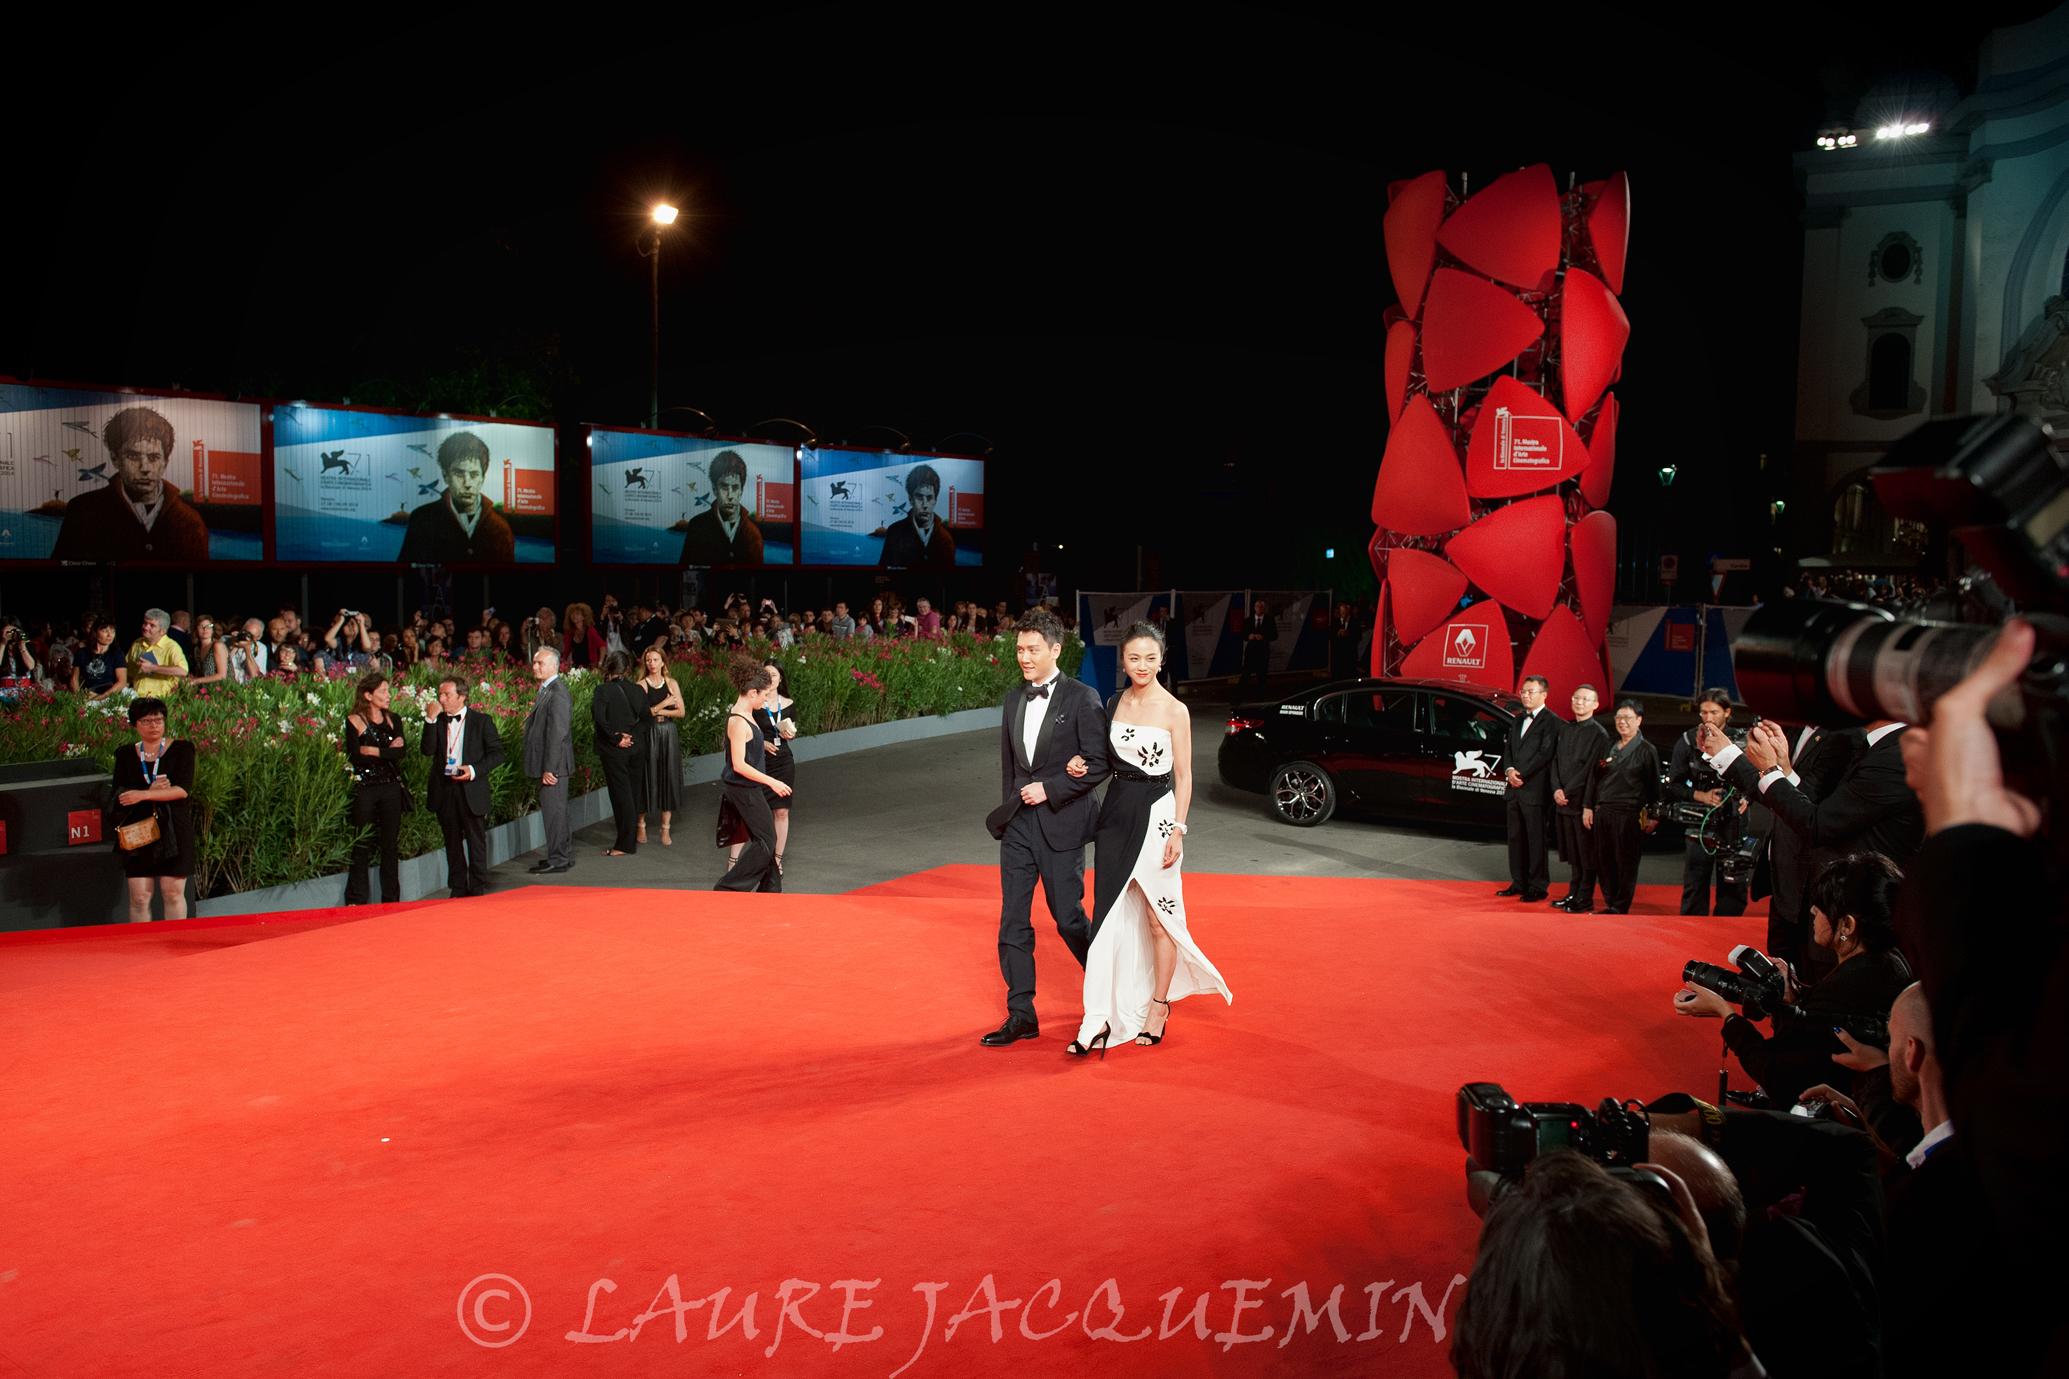 venice film festival venice laure jacquemin (5).jpg